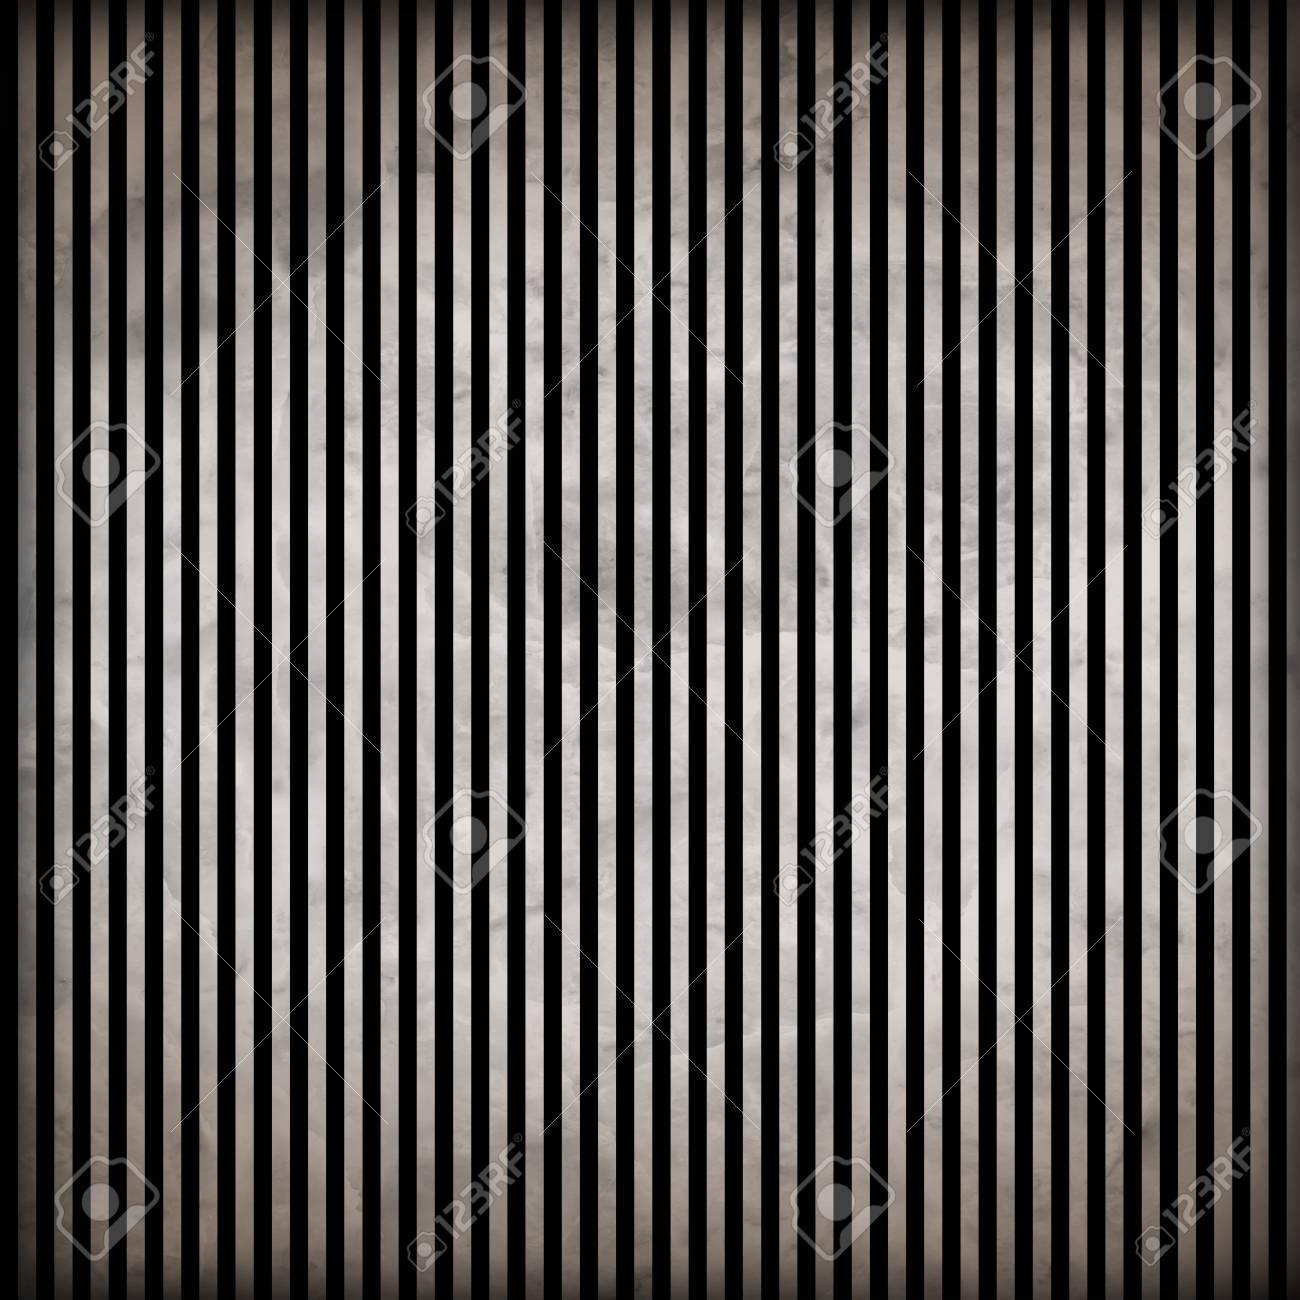 New Orleans Pinstripe Pattern Wallpaper Parchment Paper Grunge Background Texture